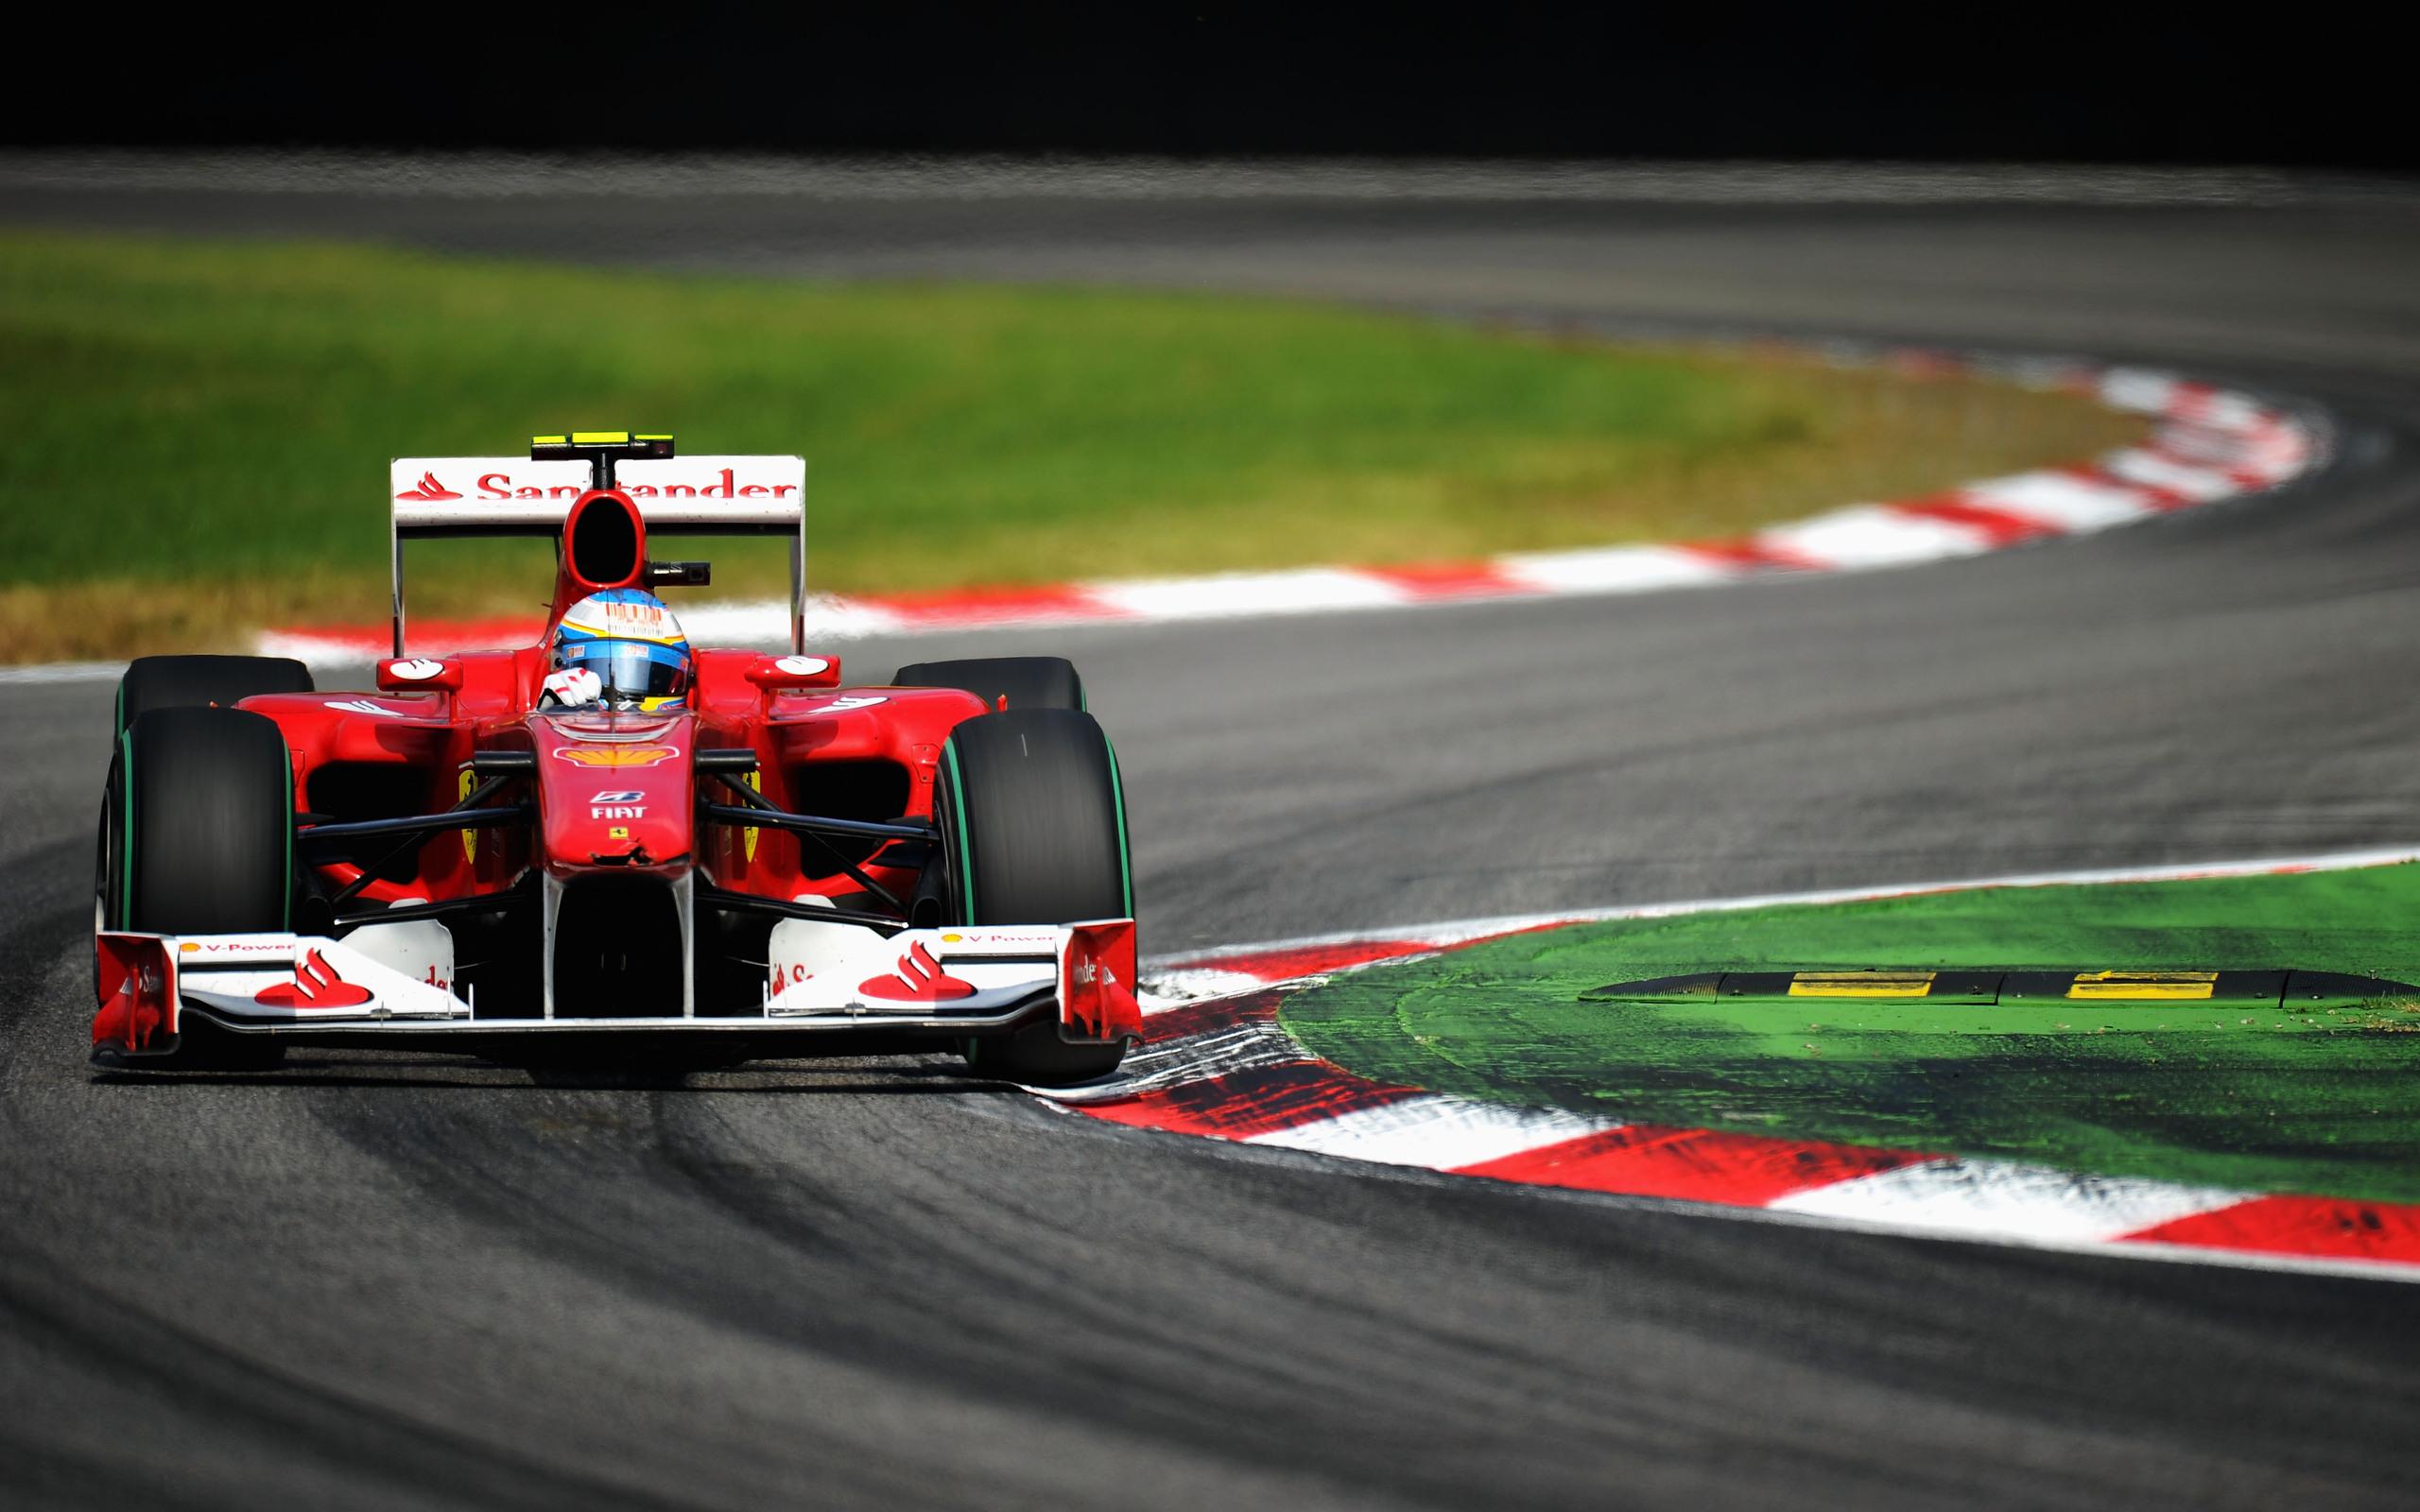 Ferrari Wallpapers  Full HD wallpaper search